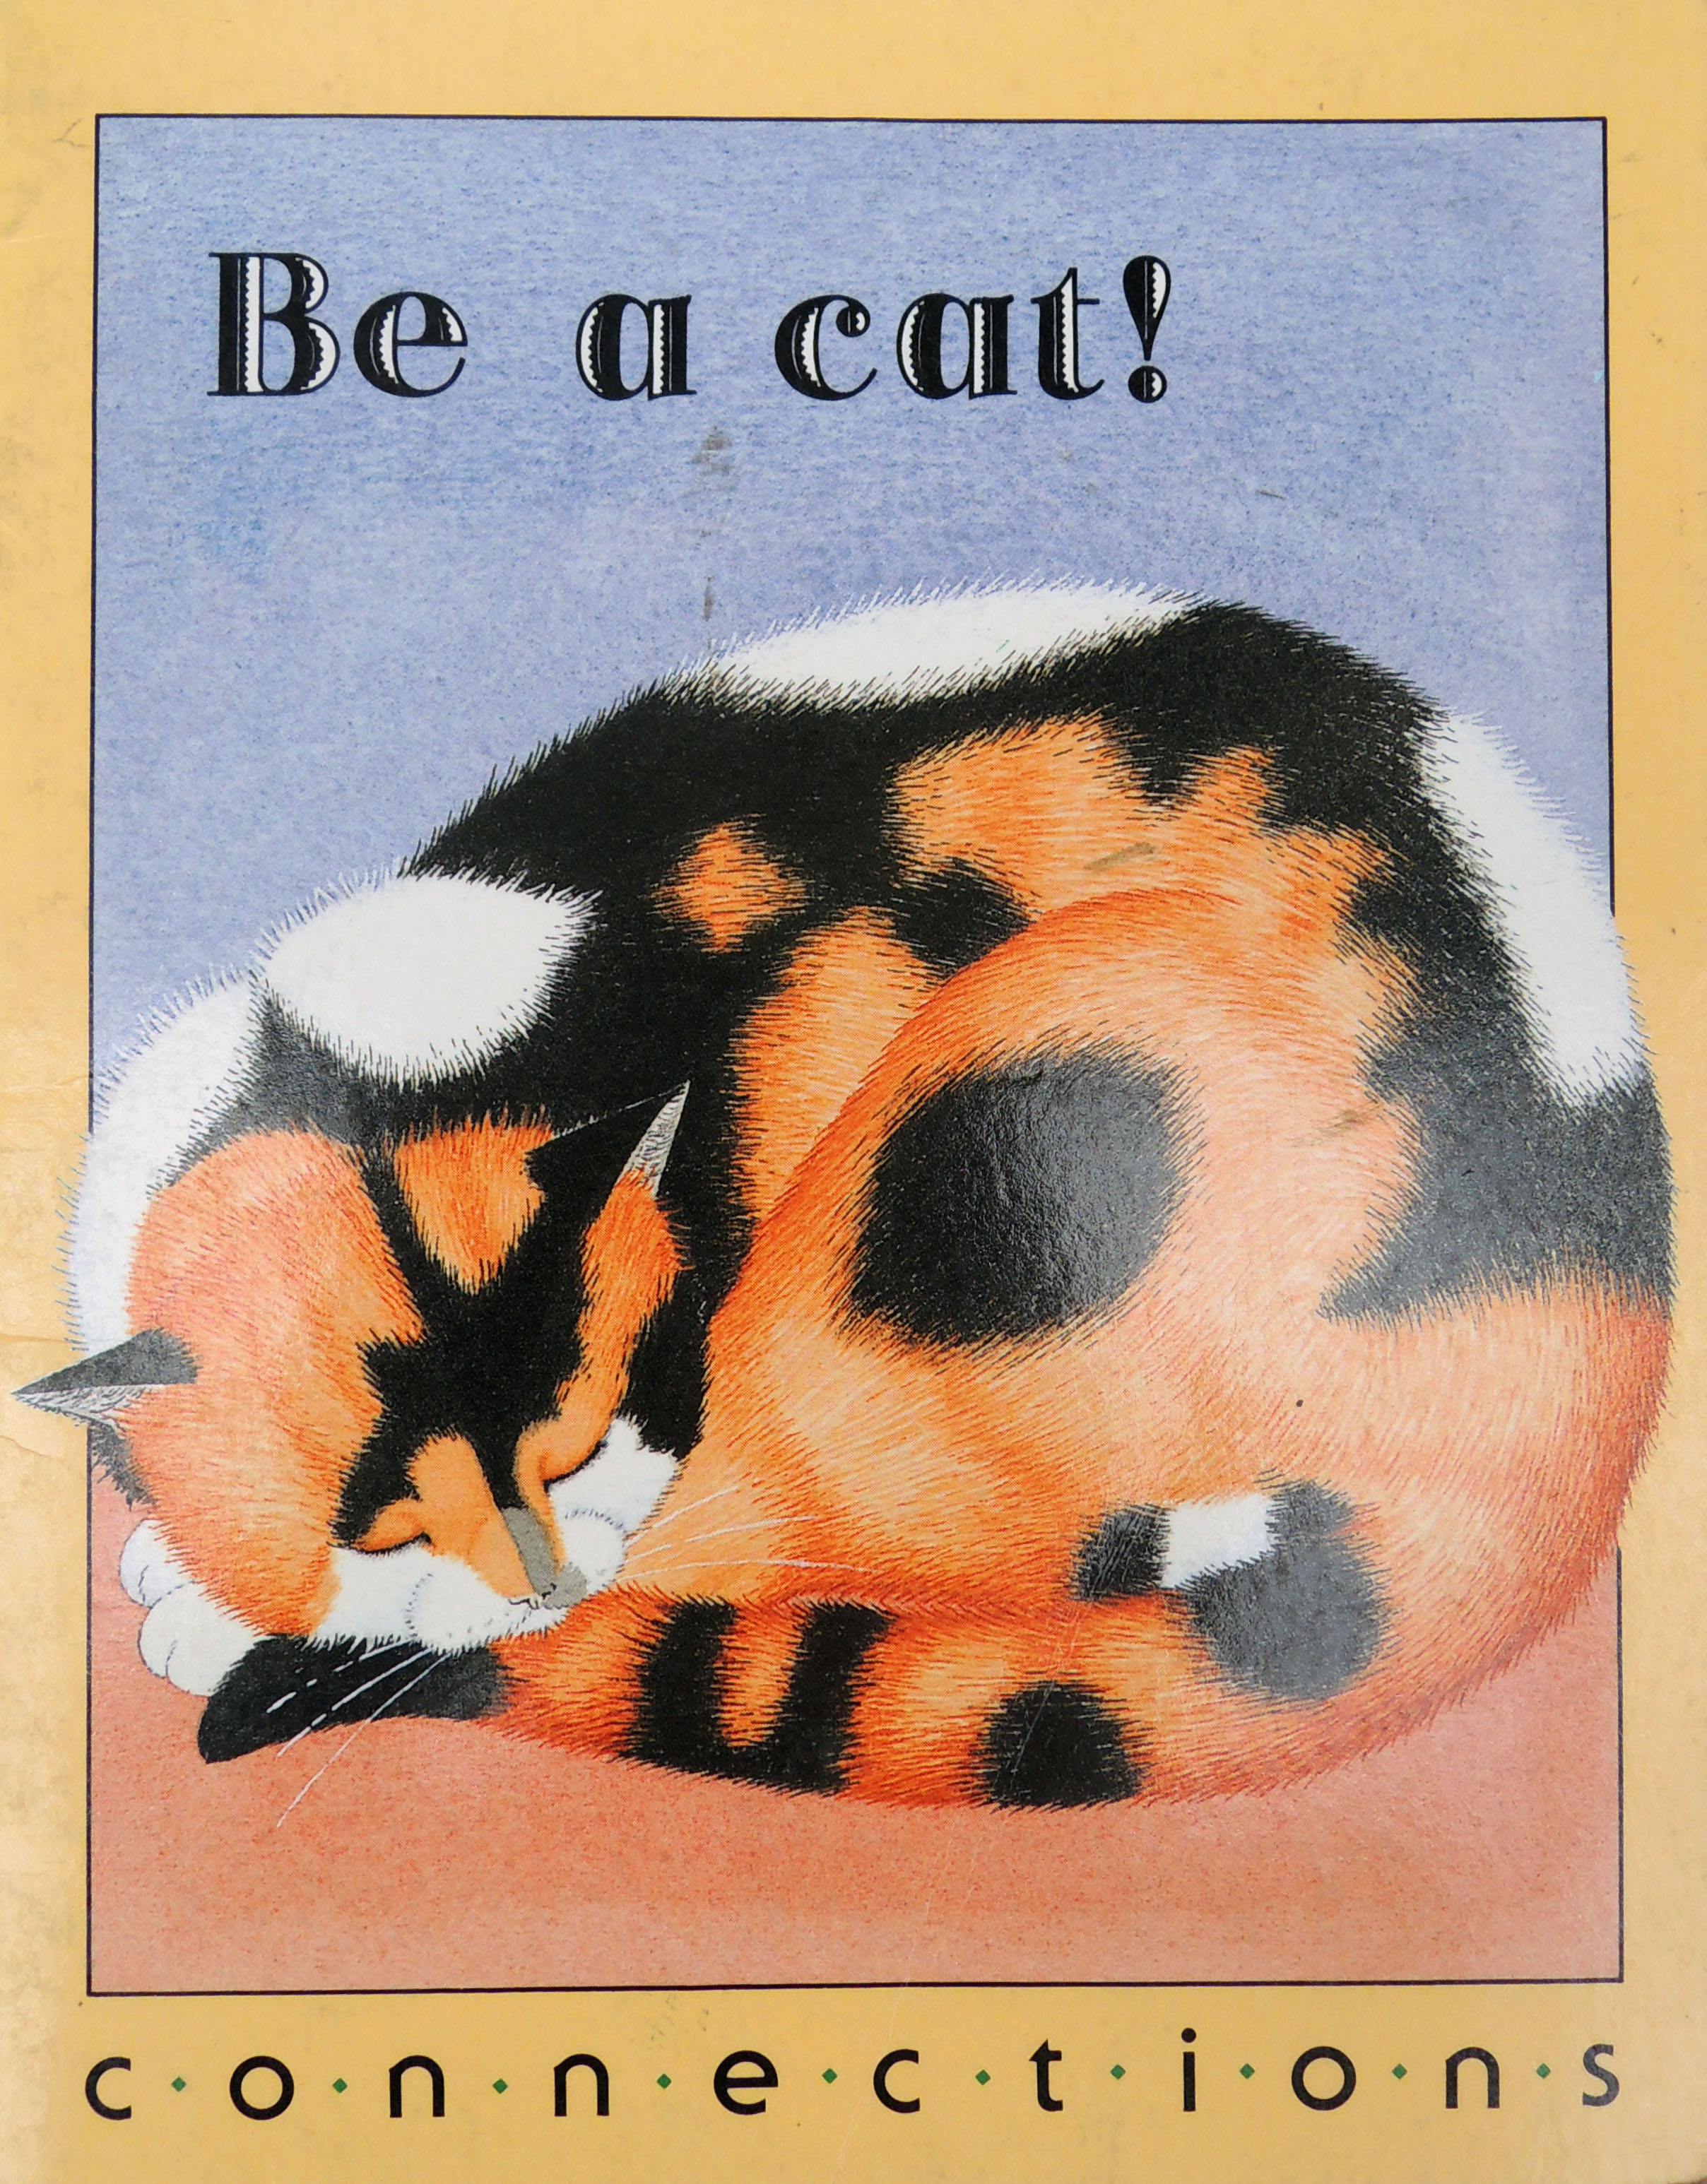 Be a Cat, 1989, childrens' book